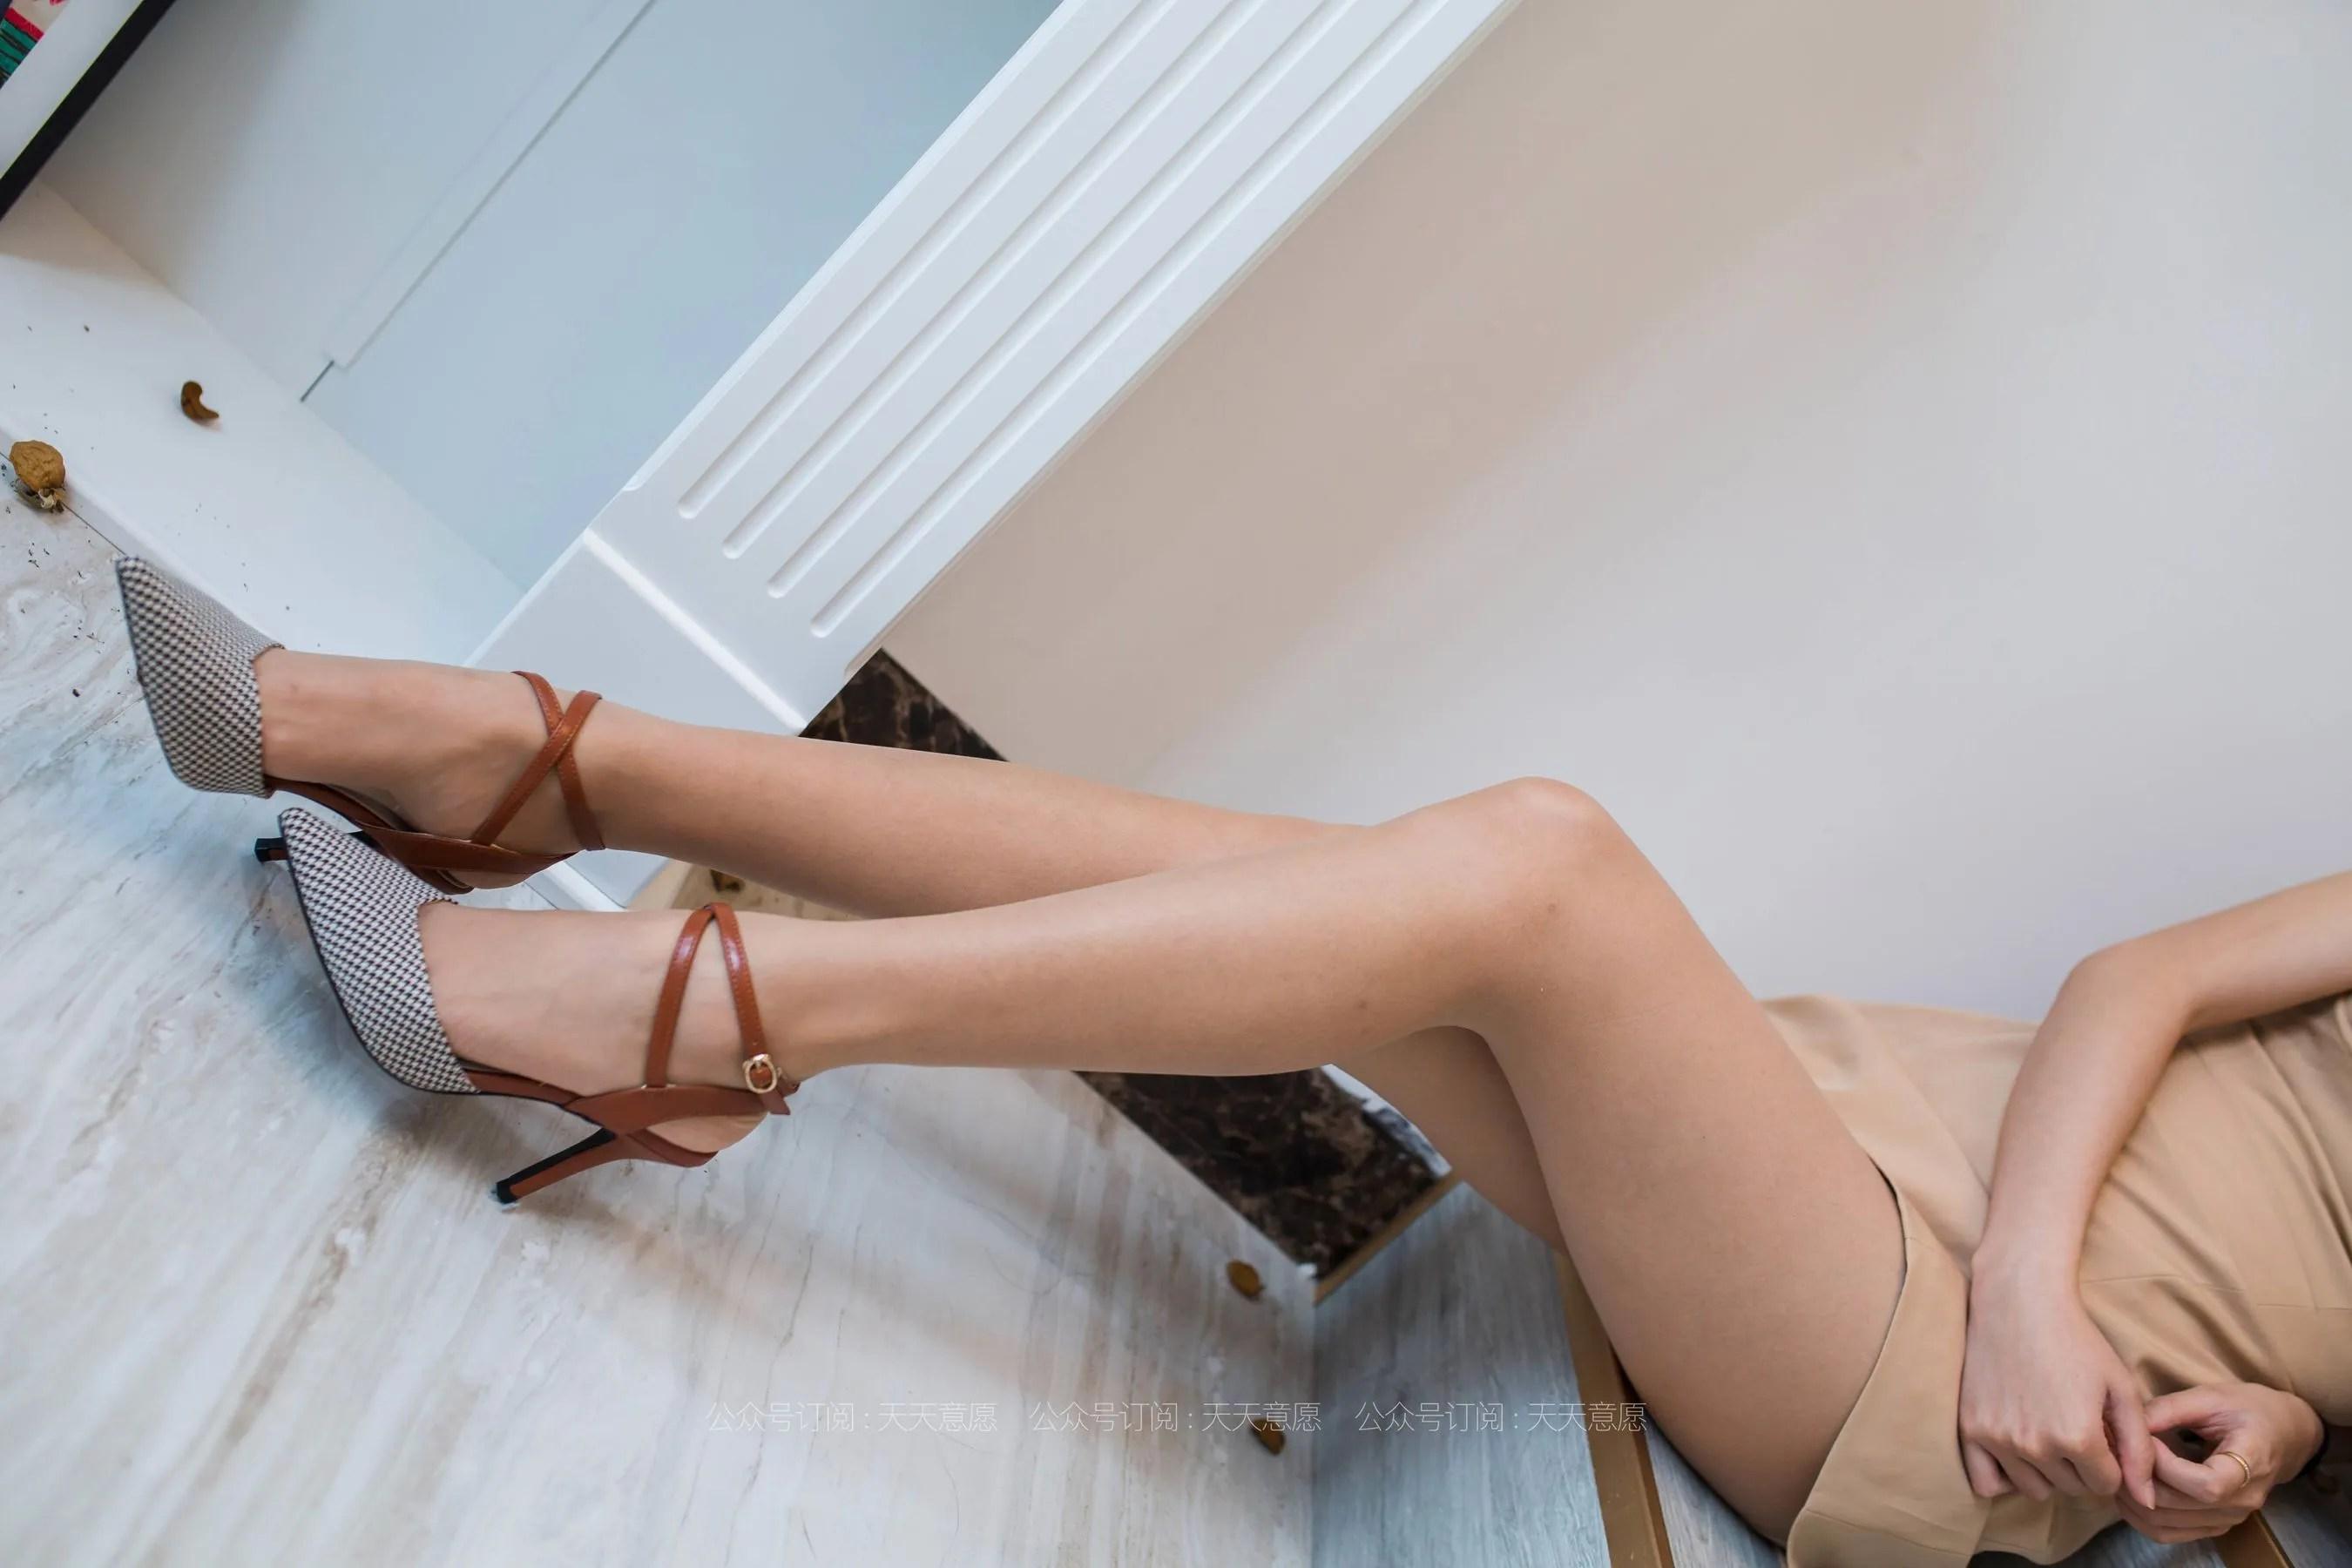 [IESS] 丝享家 770 婉萍《邻家甜美女孩》 丝袜美腿写真[90P]插图(7)